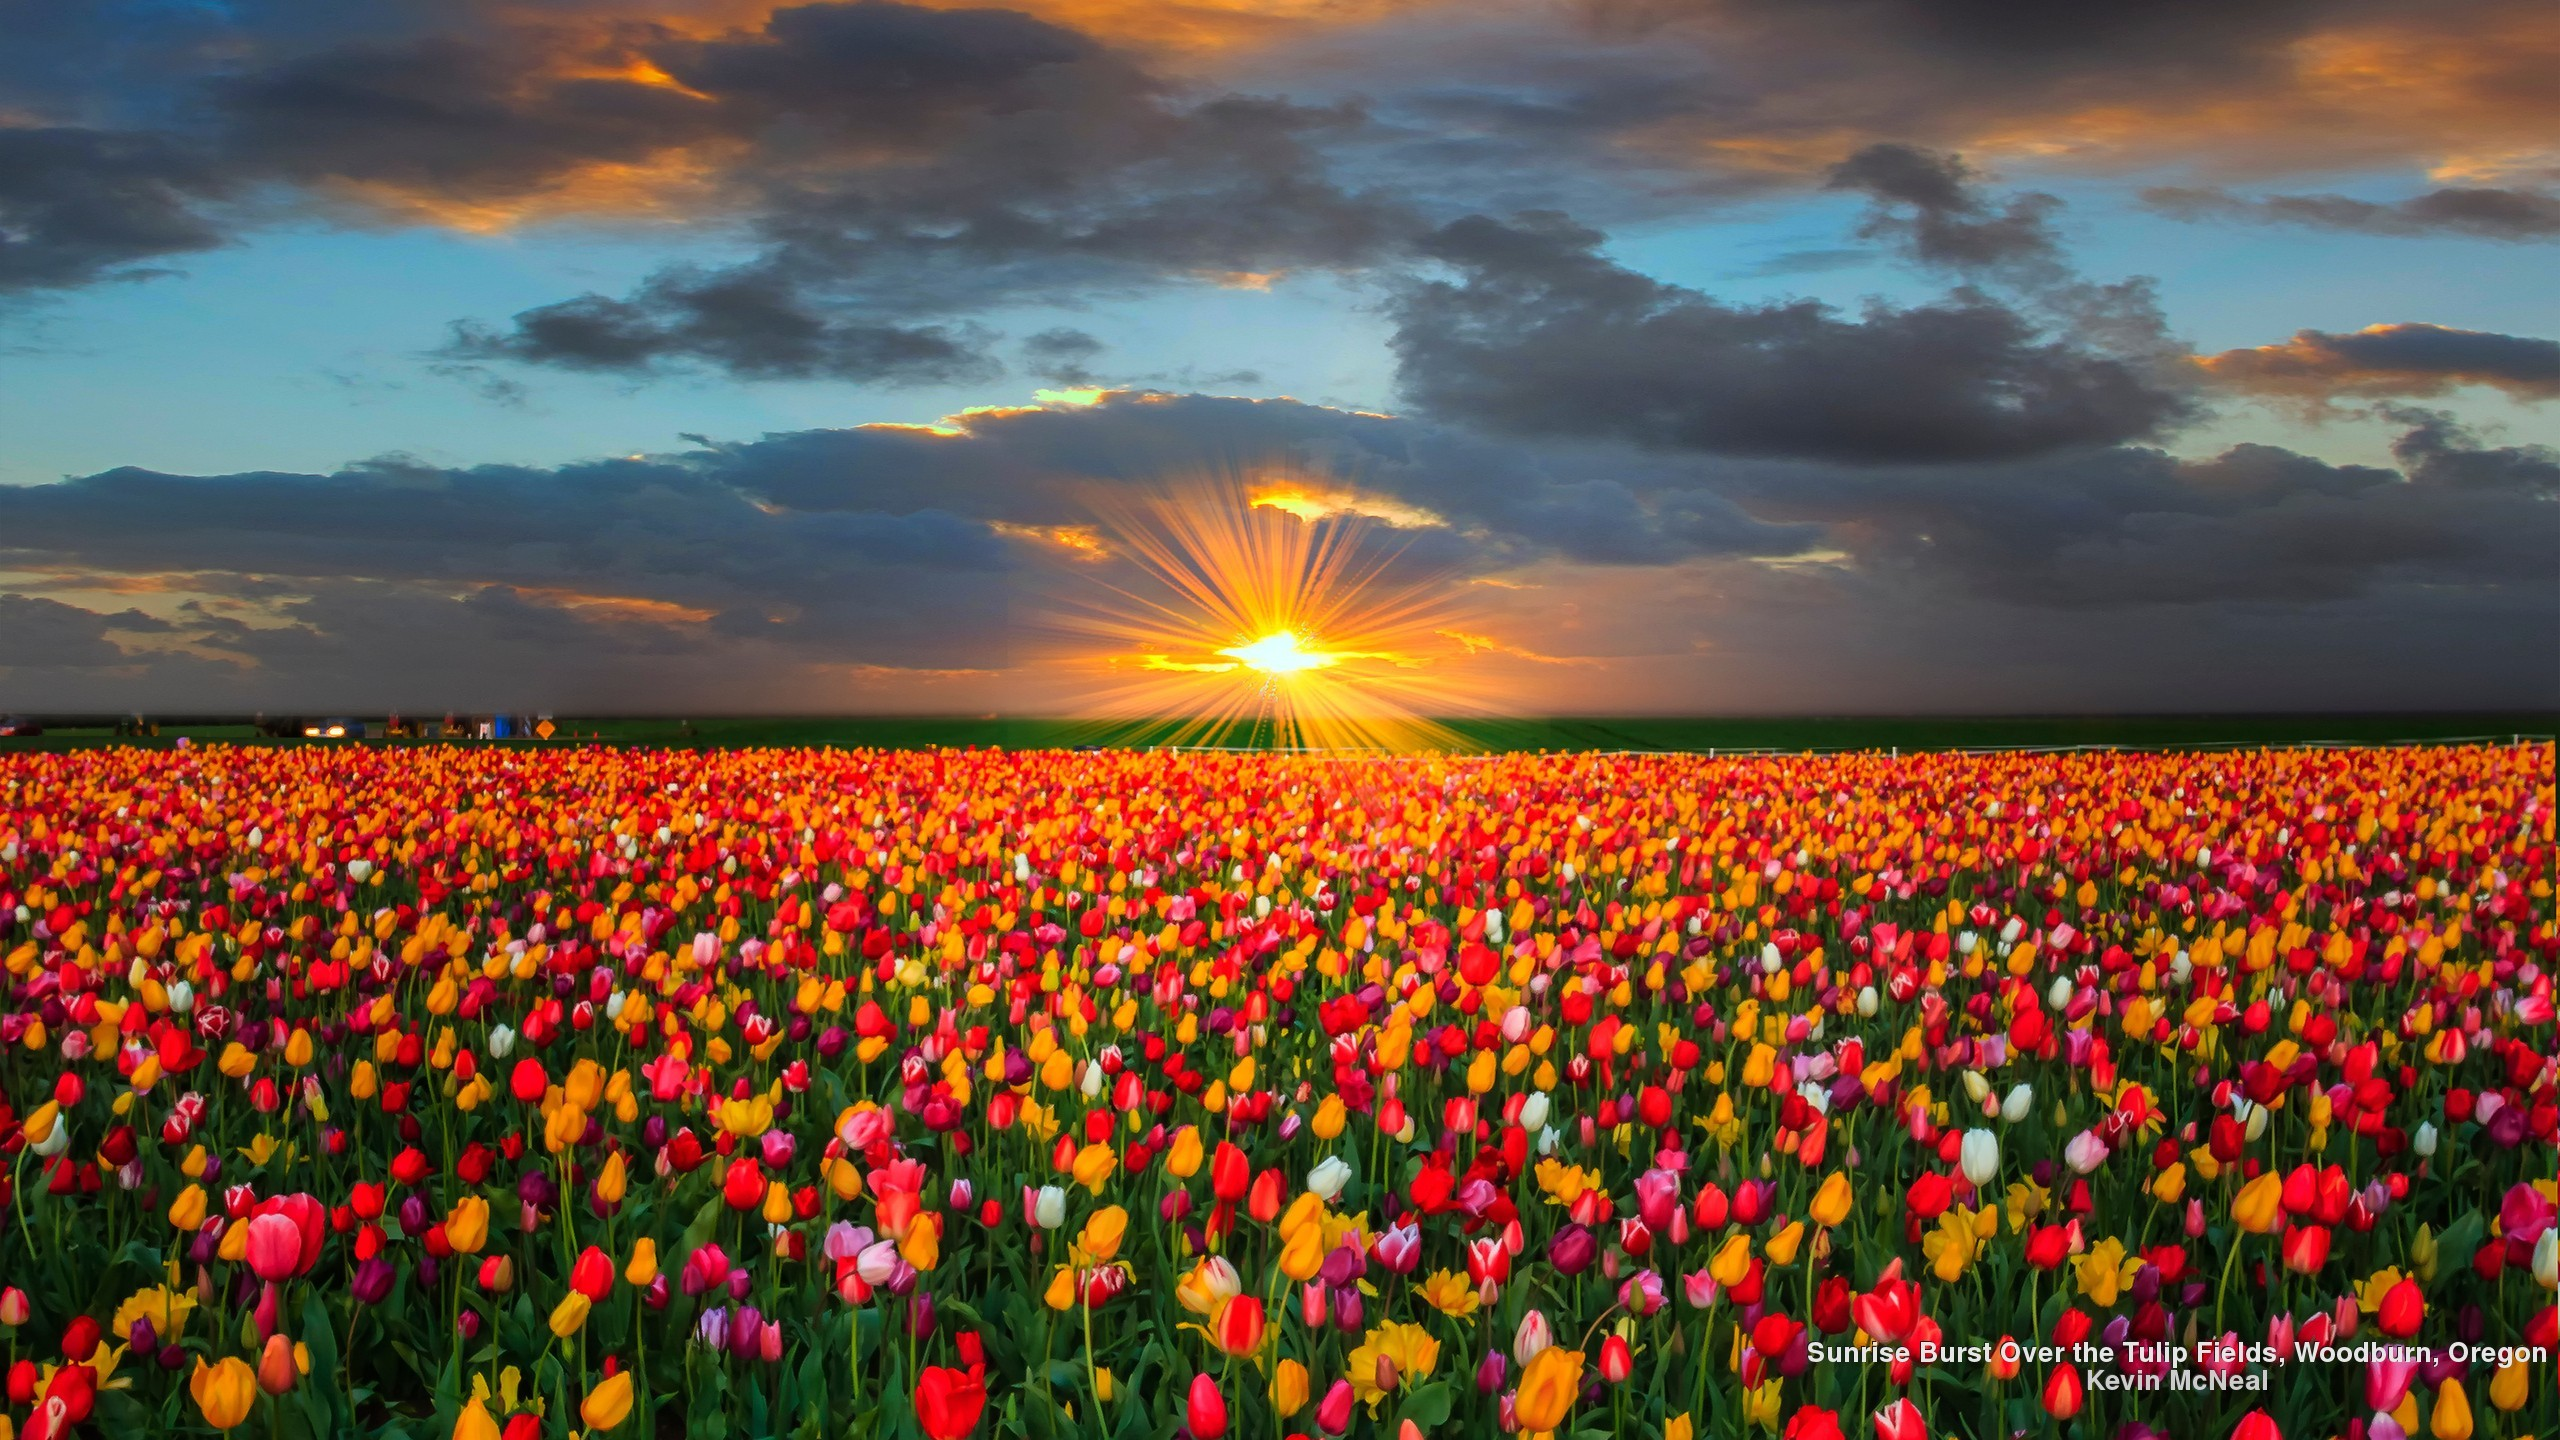 tulip desktop field fields flowers wallpapers sunflower tulips background flower sunset pink sunrise oregon sun colorful burst nature webshots gardens